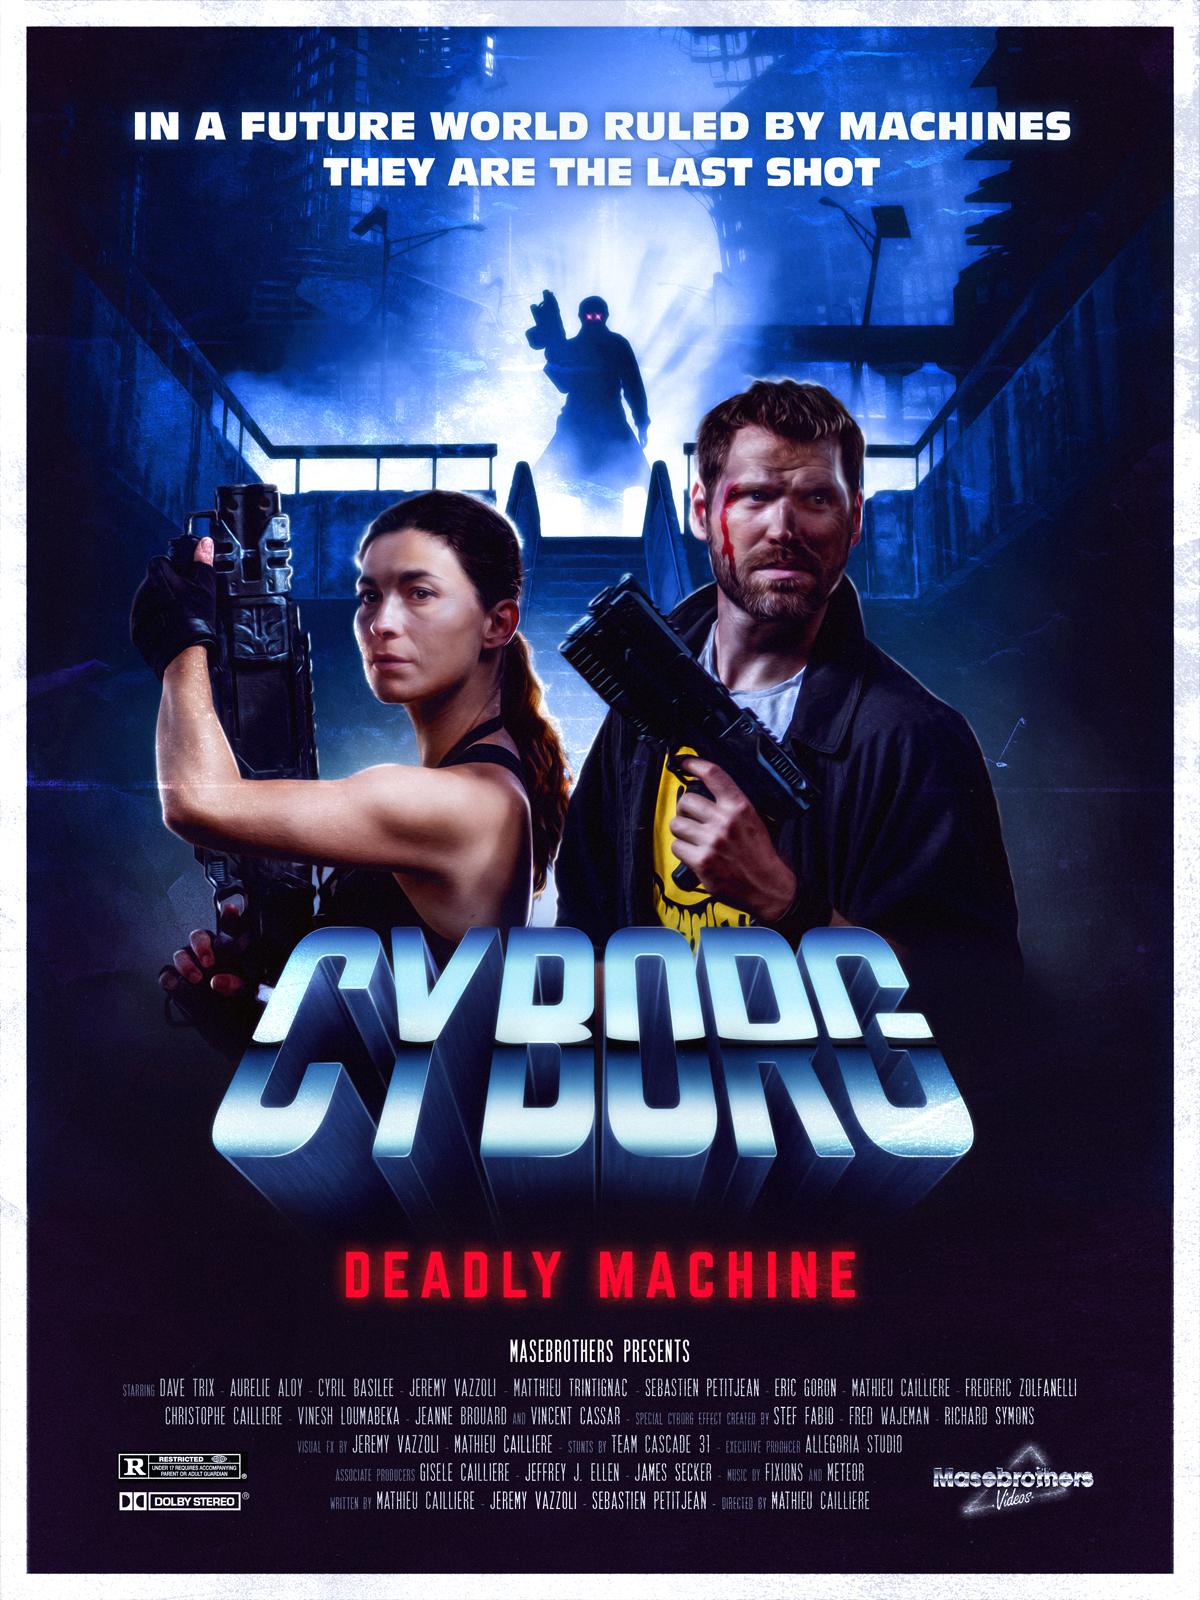 Cyborg : Deadly Machine - film 2020 - AlloCiné